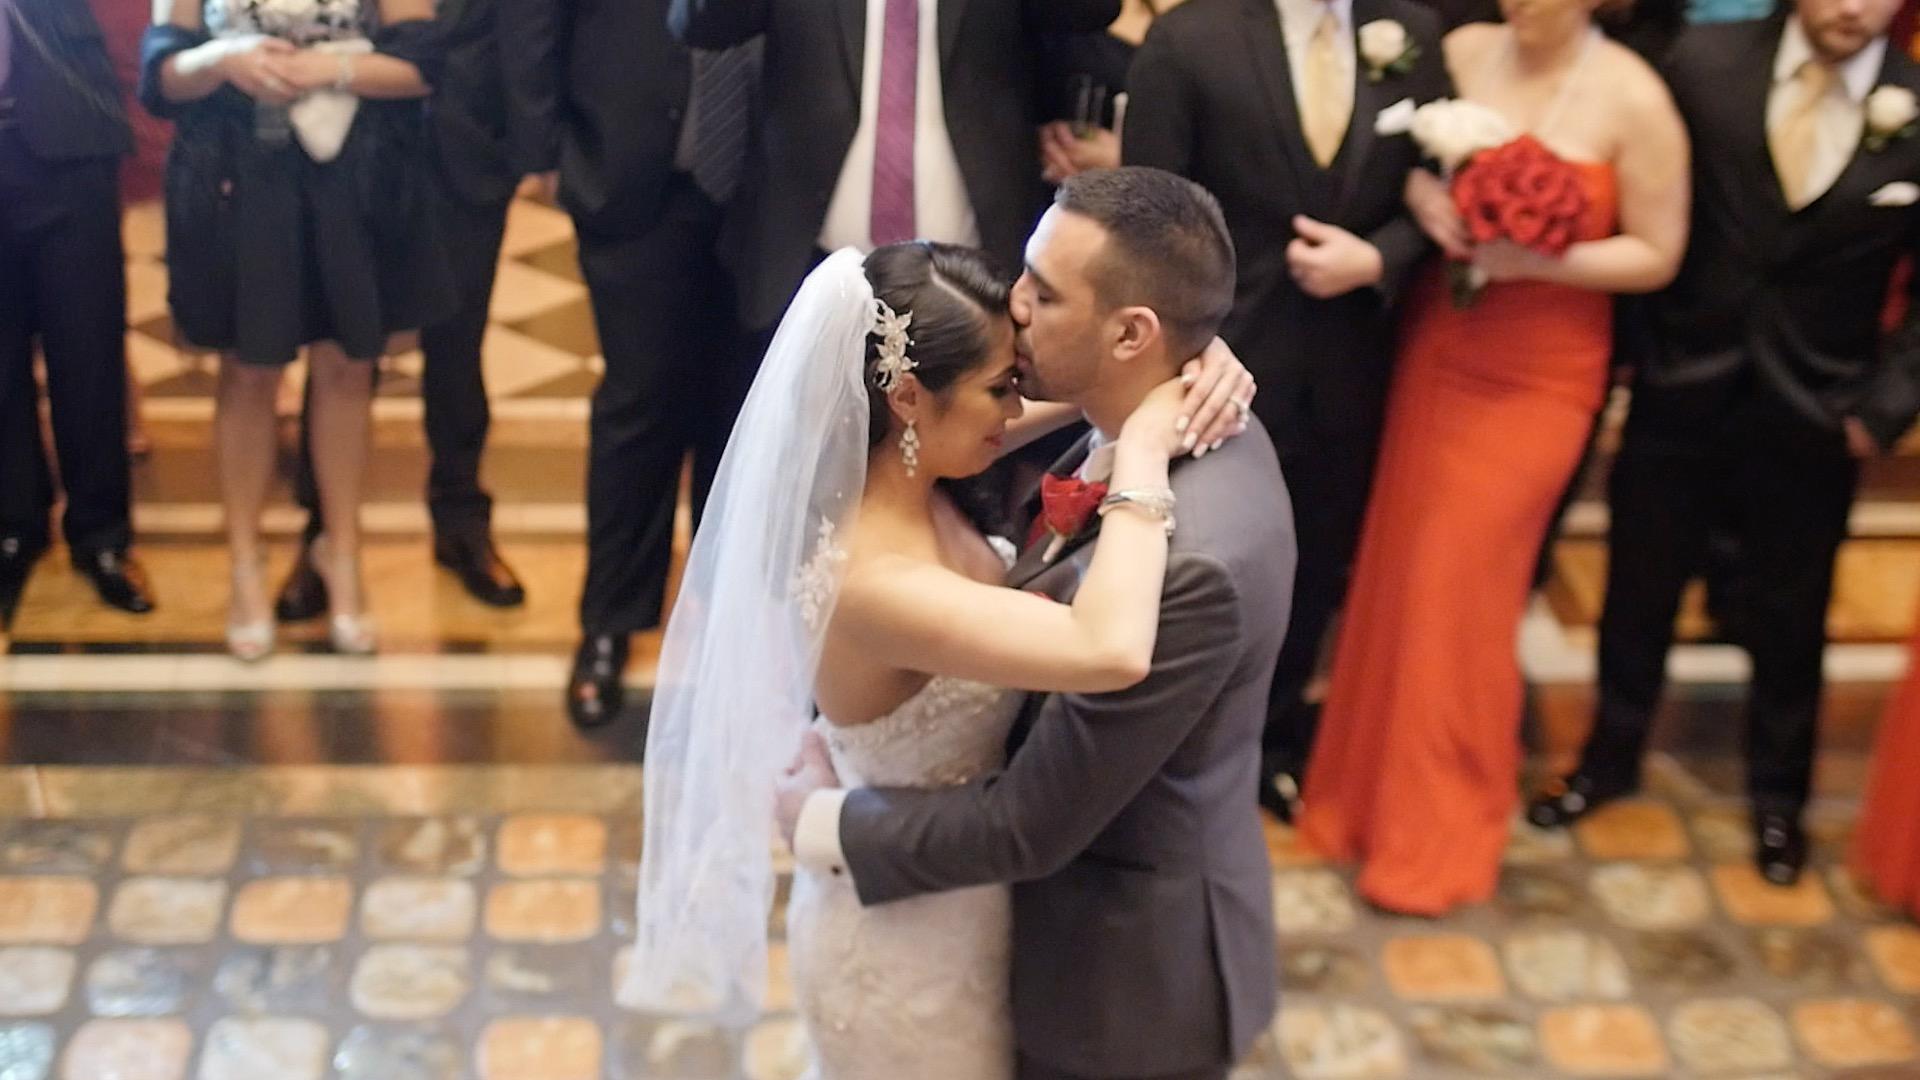 Wedding at The Cruz building in Coconut Grove FL